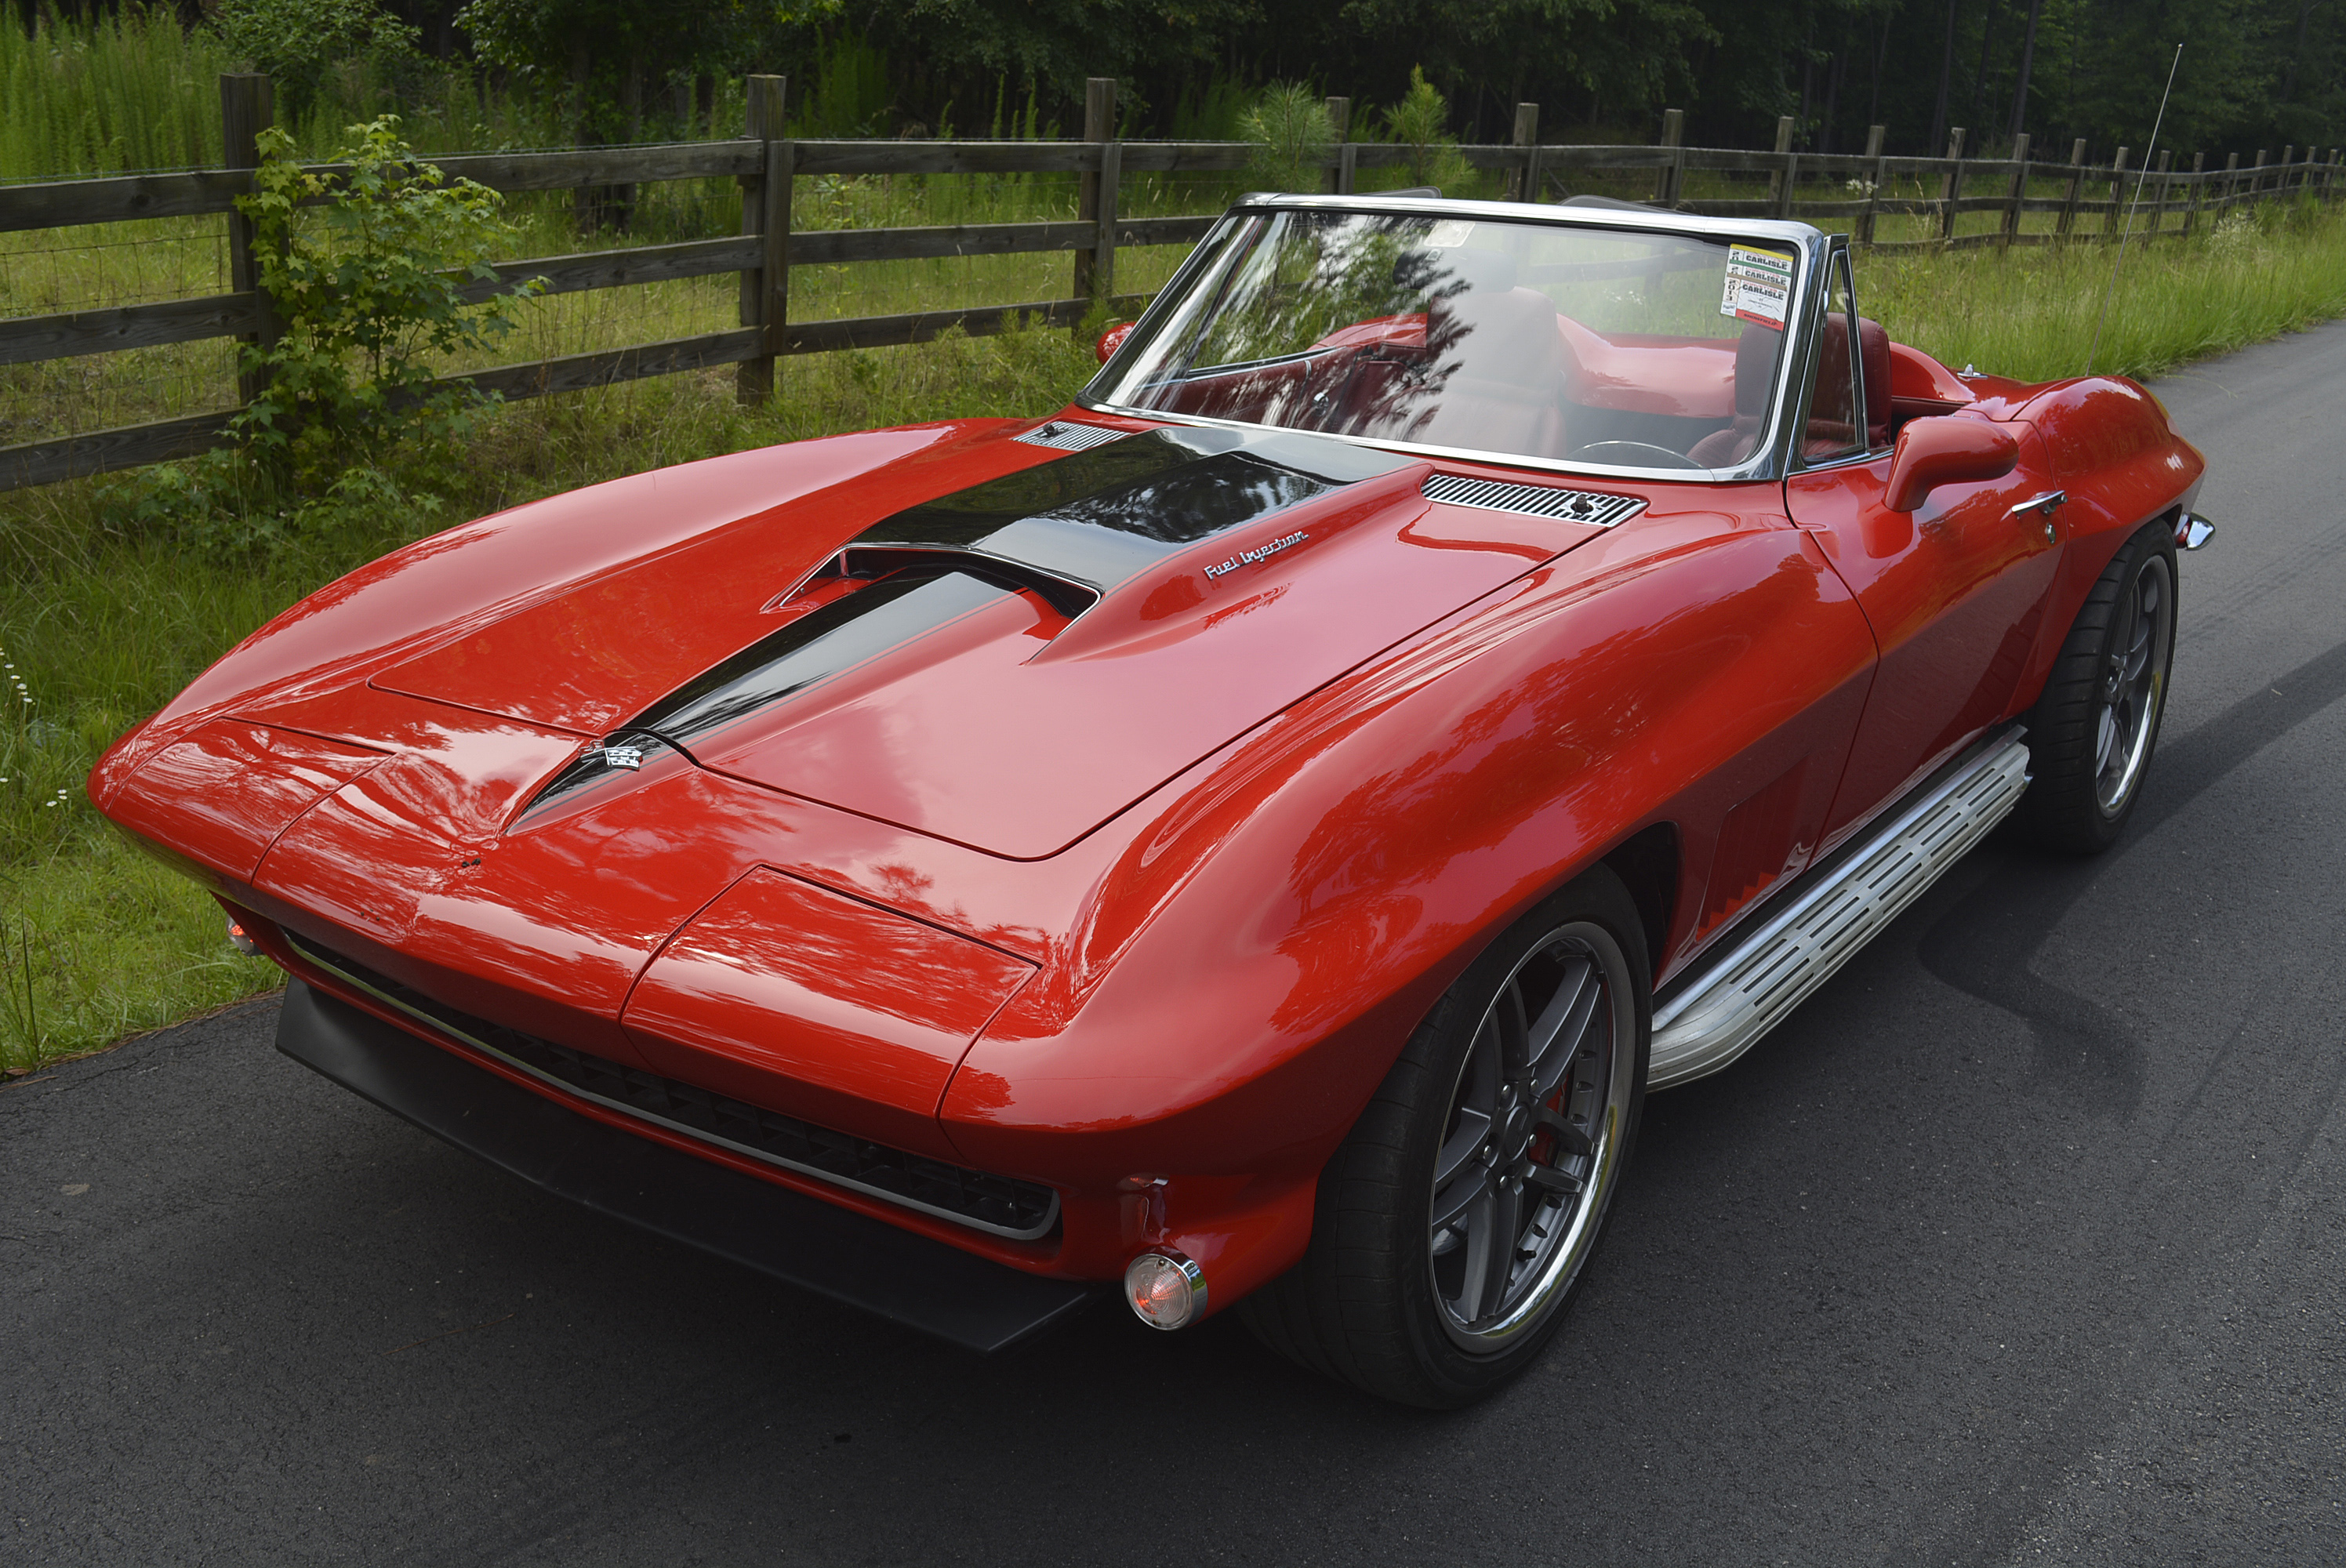 67 Resto Mod Corvette Autos Post